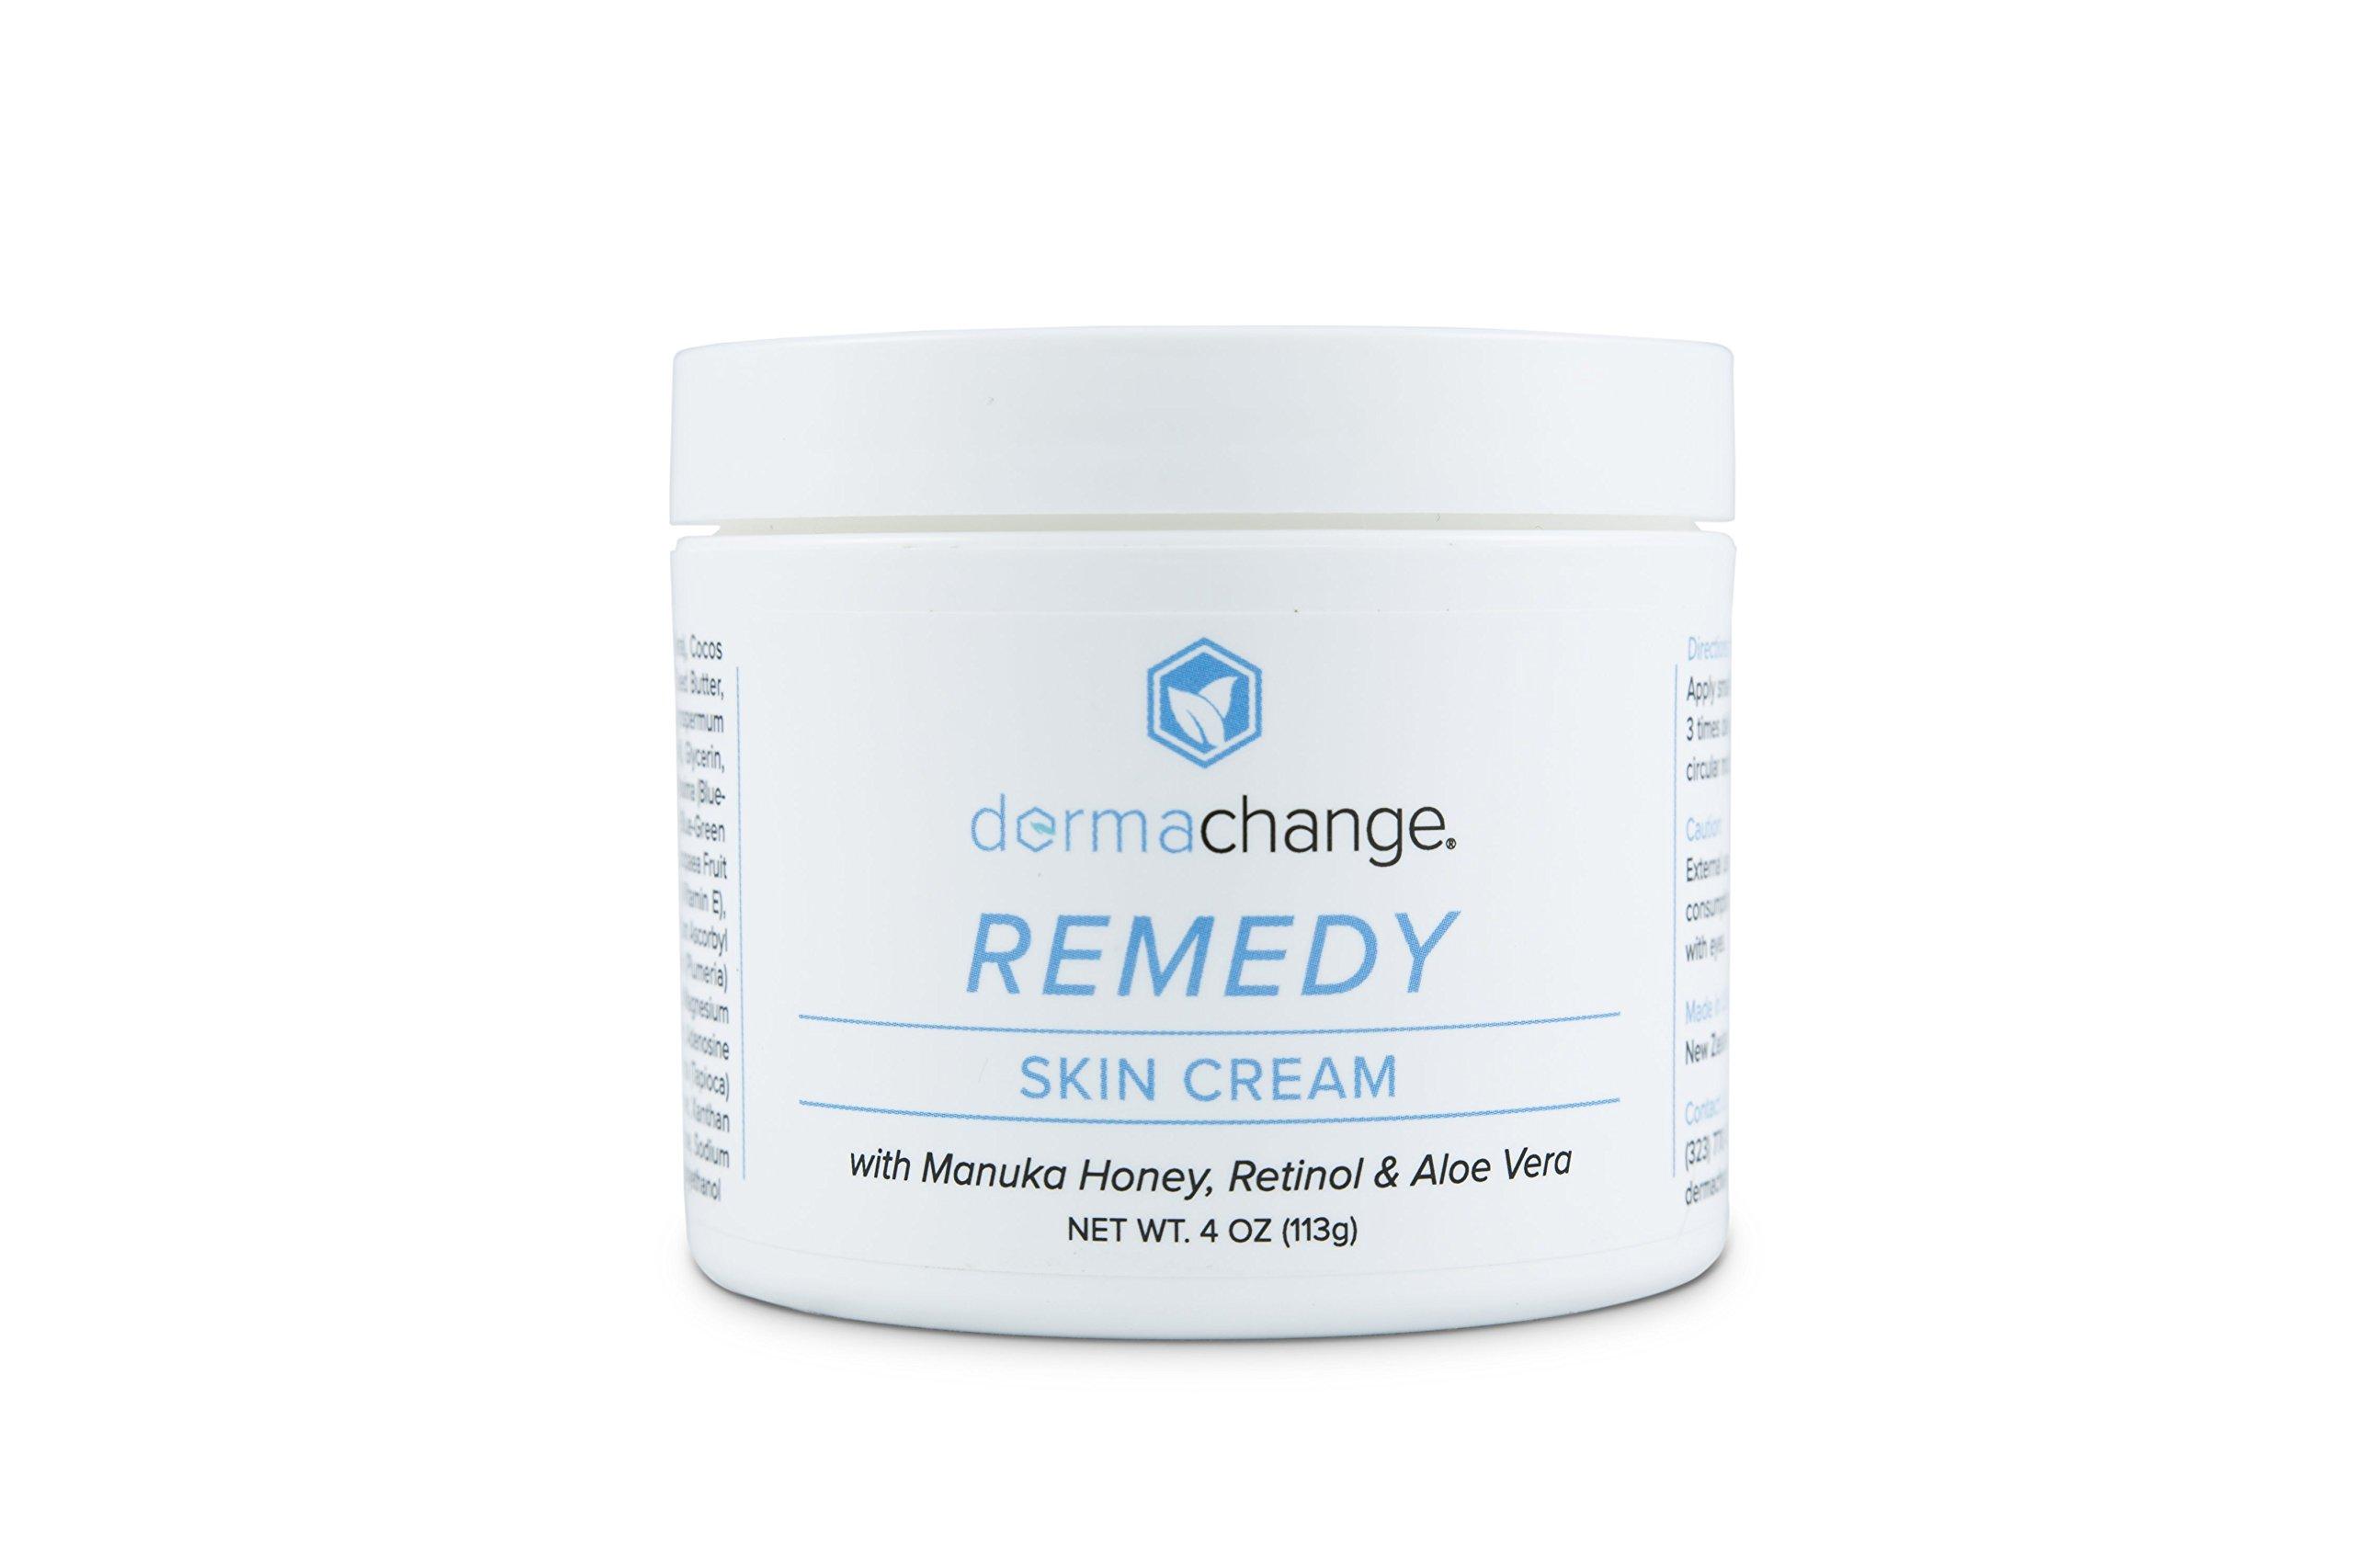 Organic Tightening and Moisturizing Retinol Skin Cream - For Face and Body - Anti Aging - Night And Day Cream For Men and Women - Redness, Skin Rash & Ezcema Treatment (4oz) - Made in USA